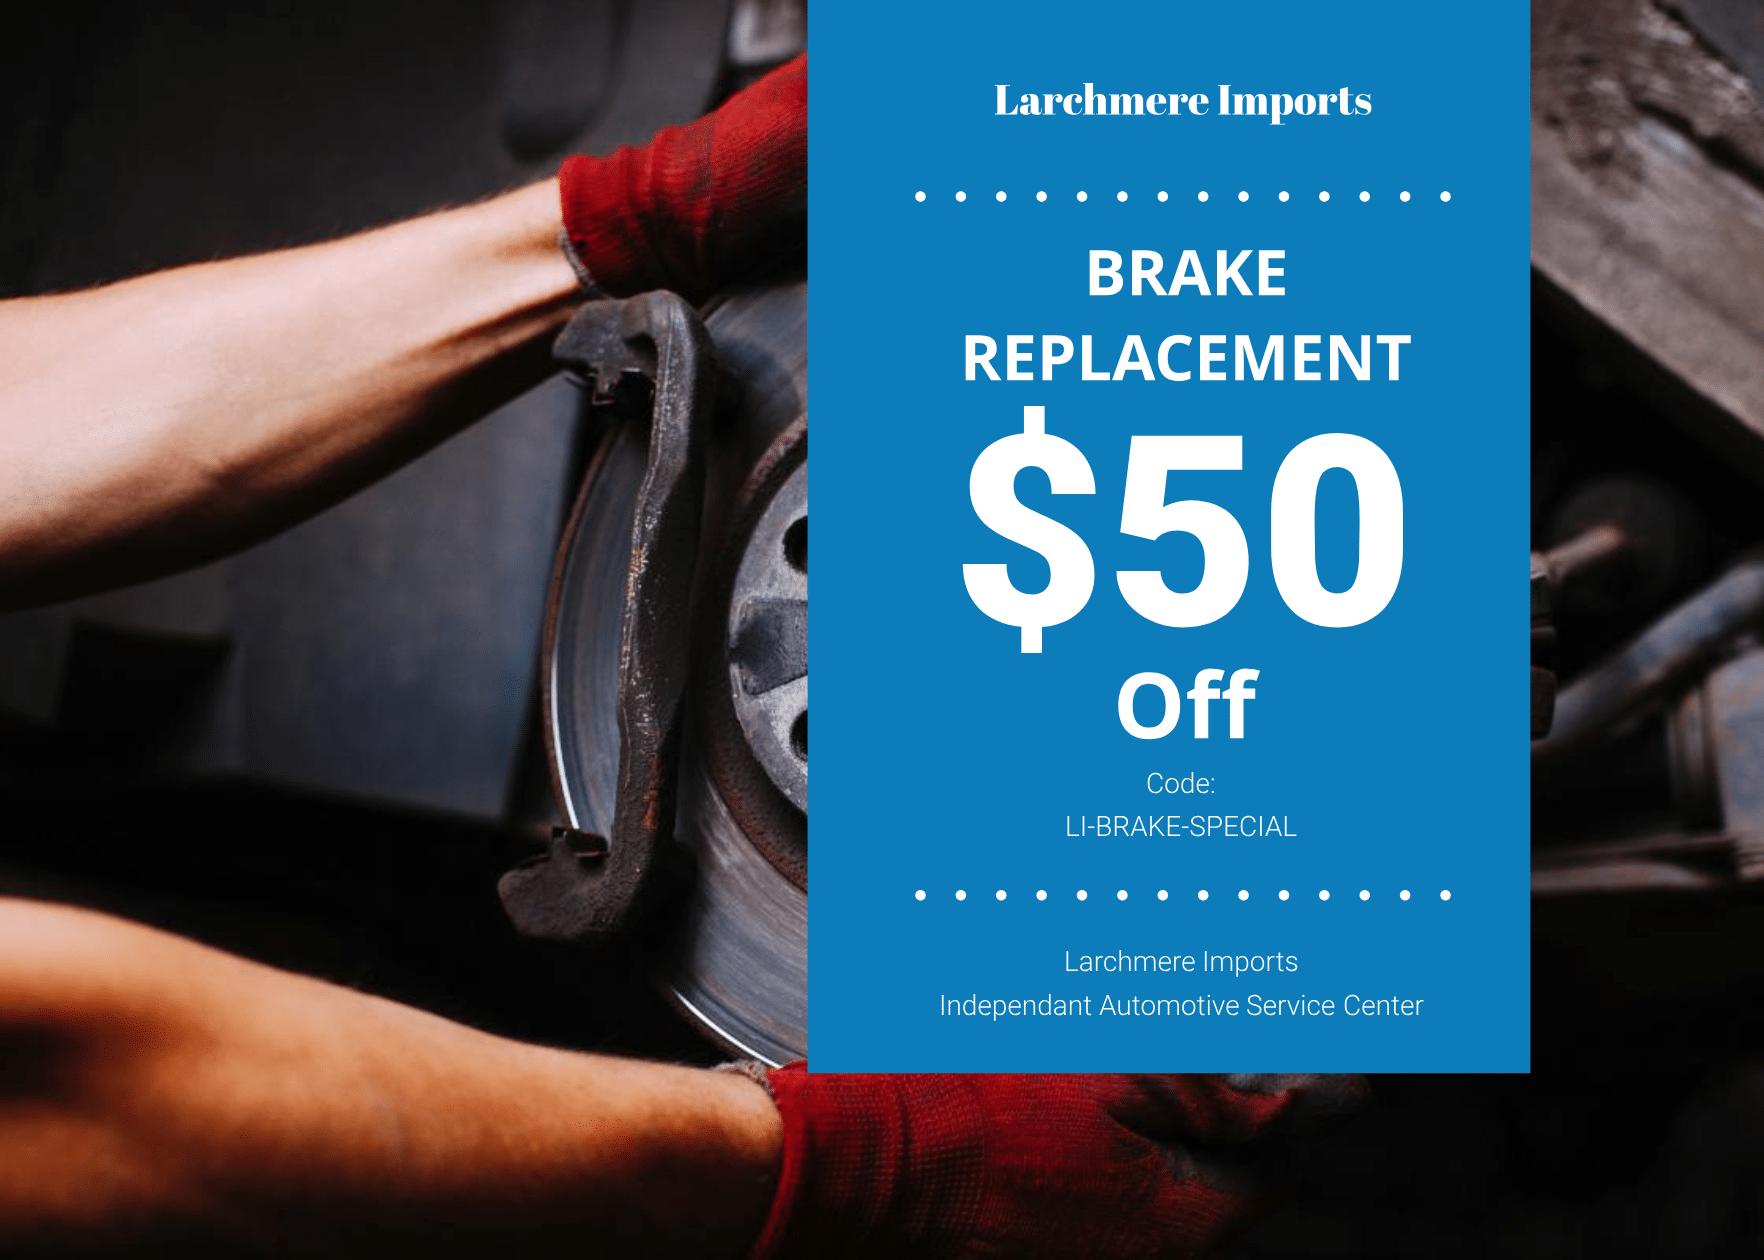 Brake Replacement Coupon